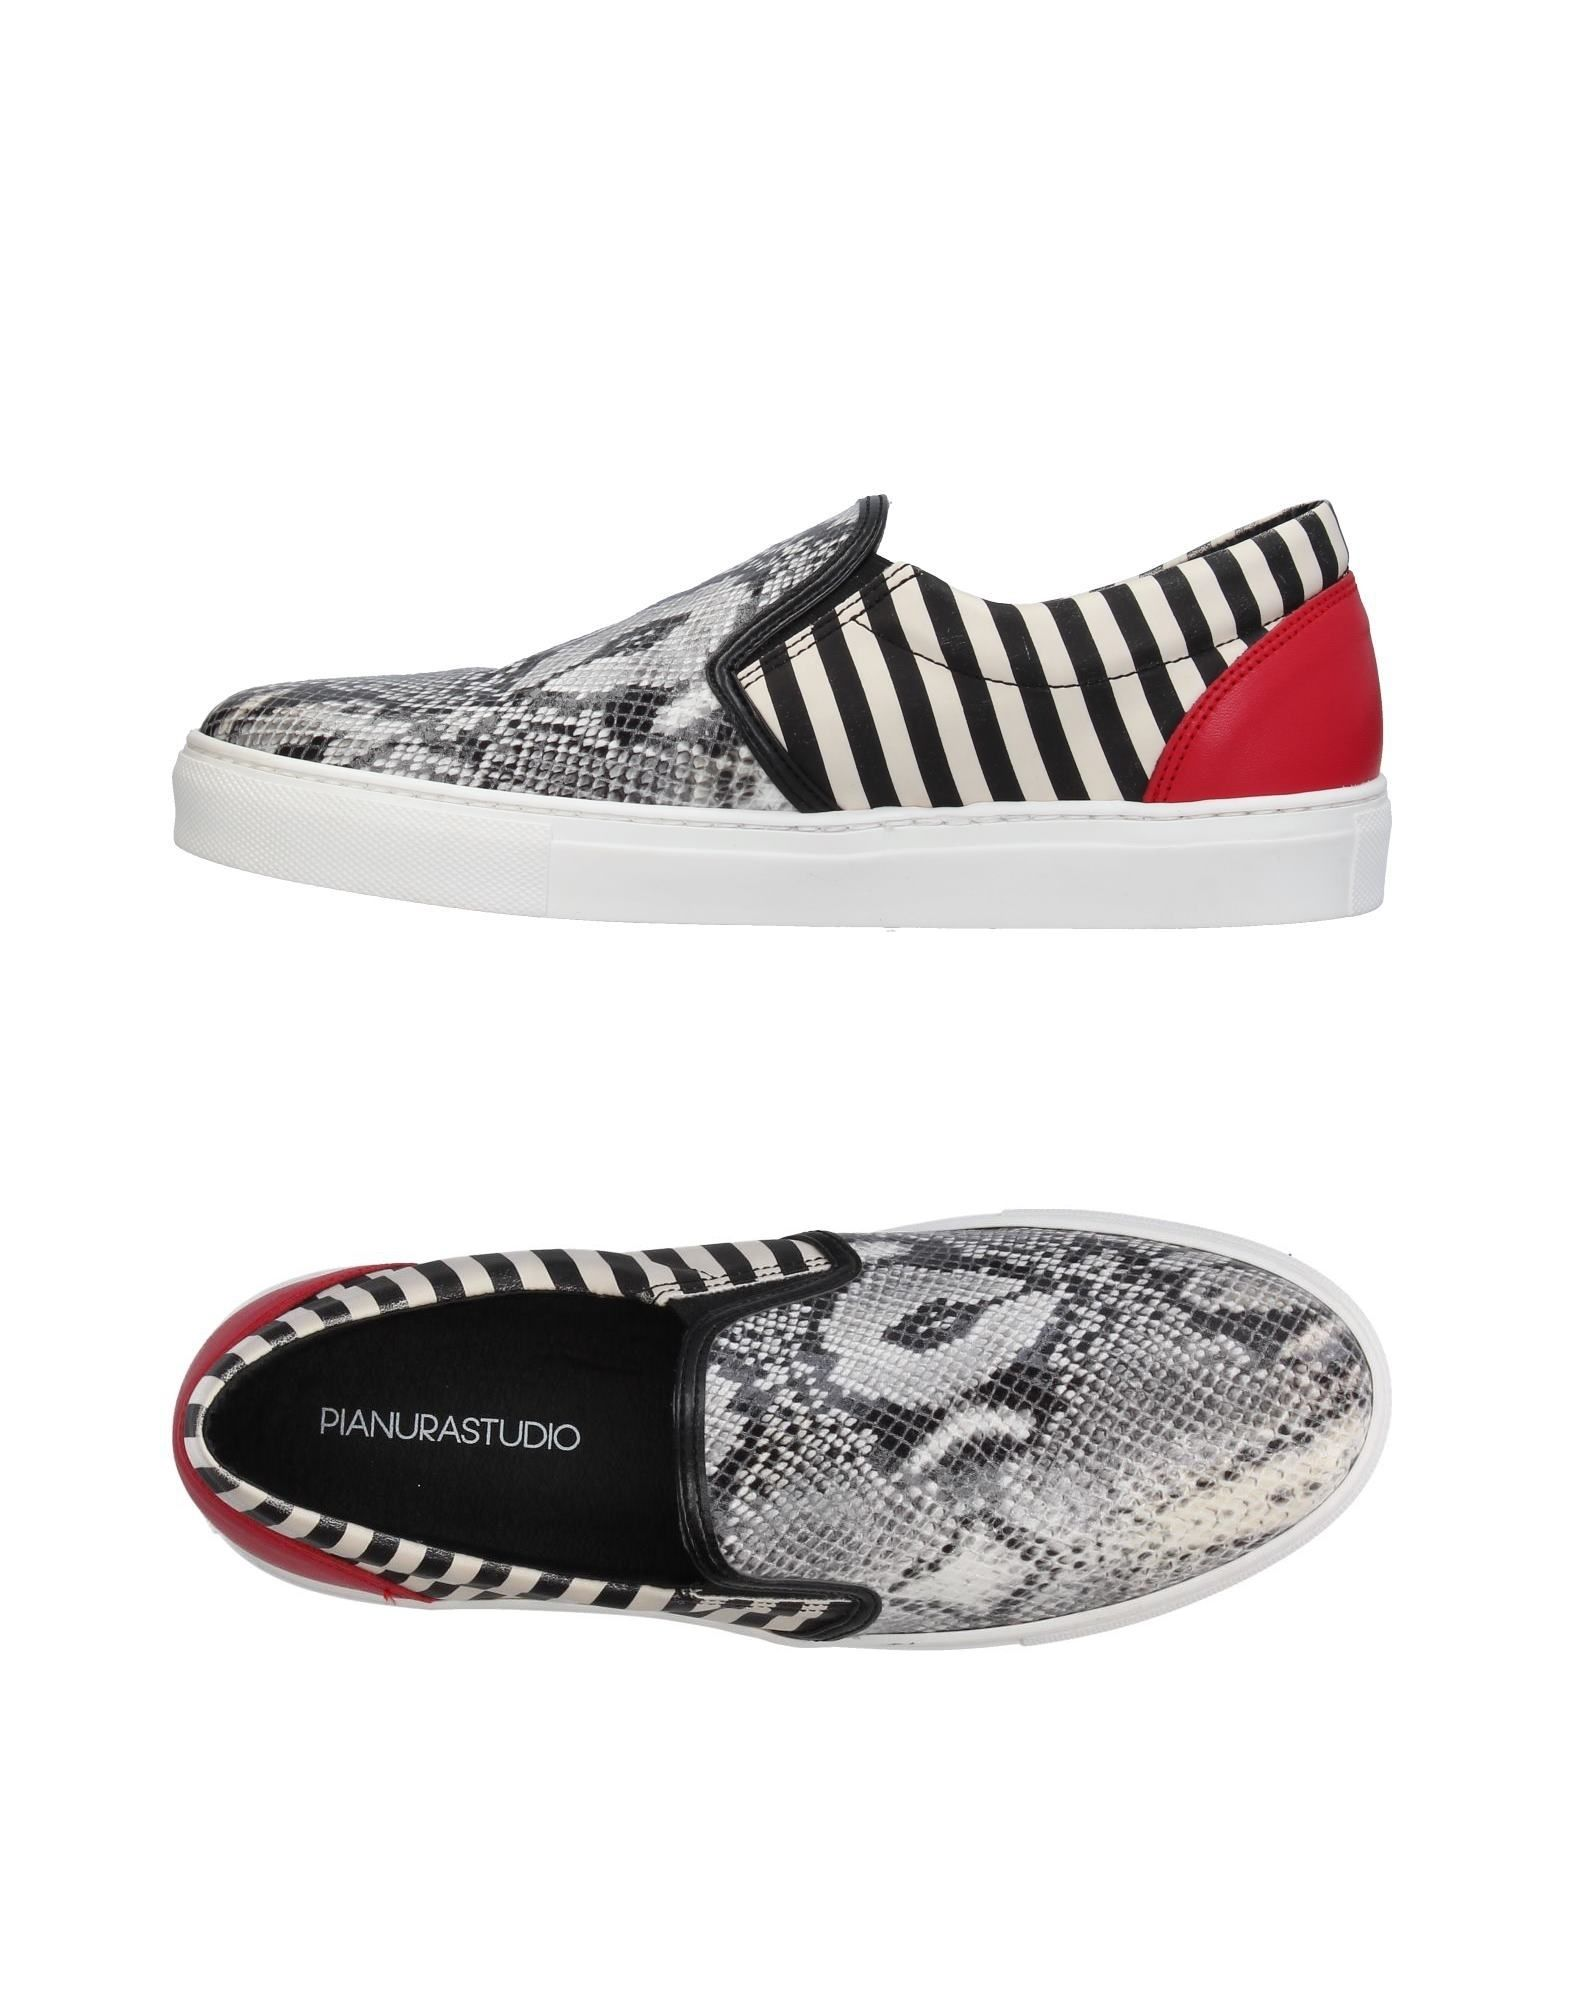 A buon mercato Sneakers Pianurastudio Donna - 11401184XU